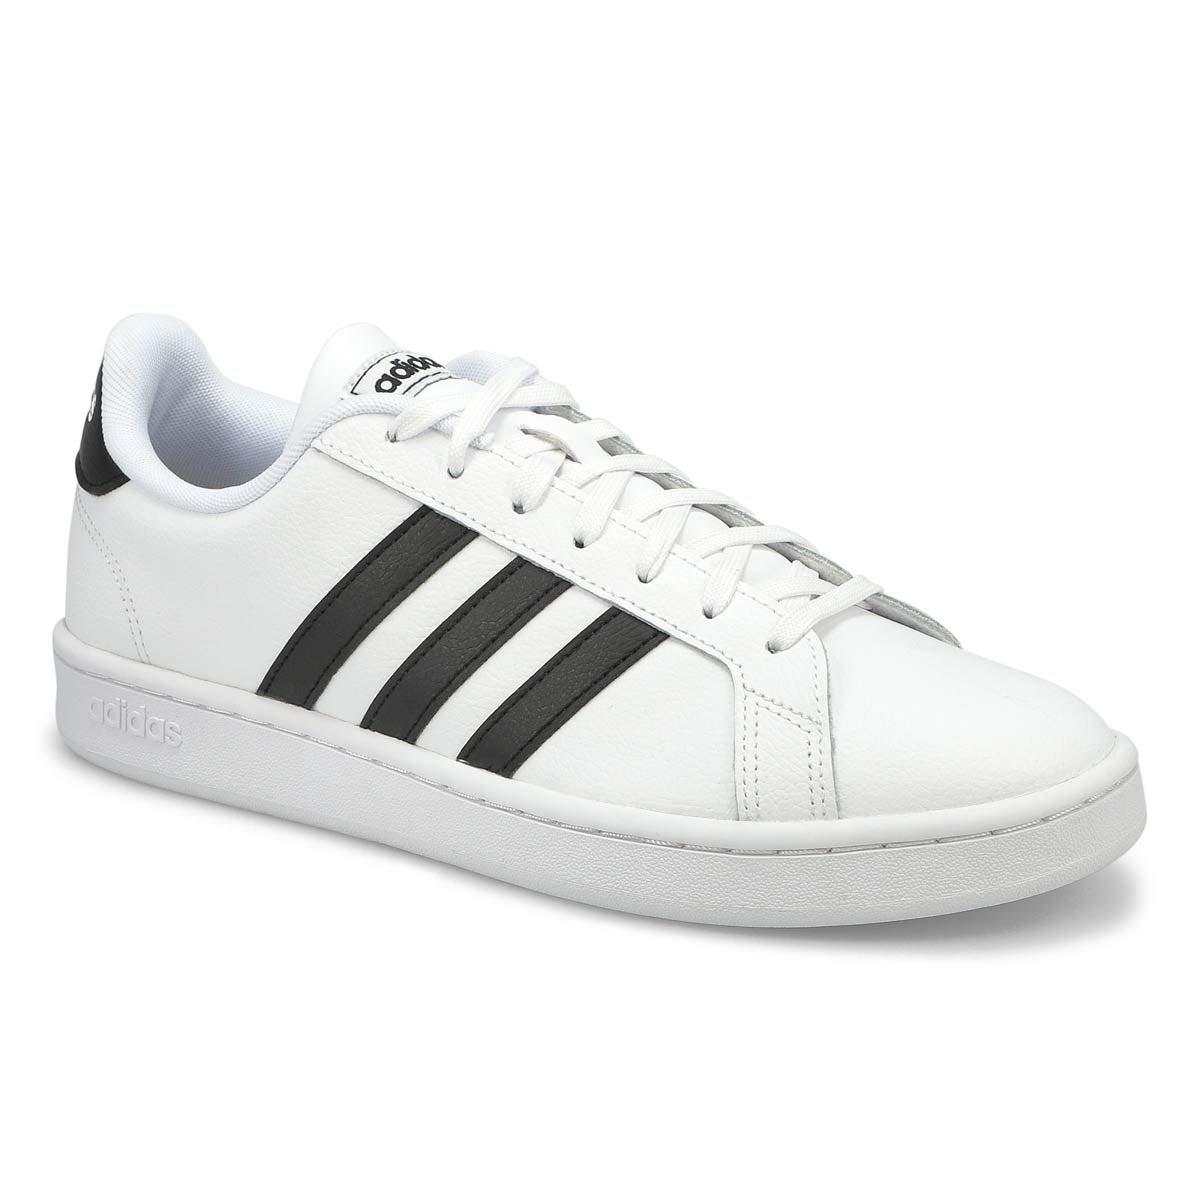 Men's GRAND COURT white/black sneakers